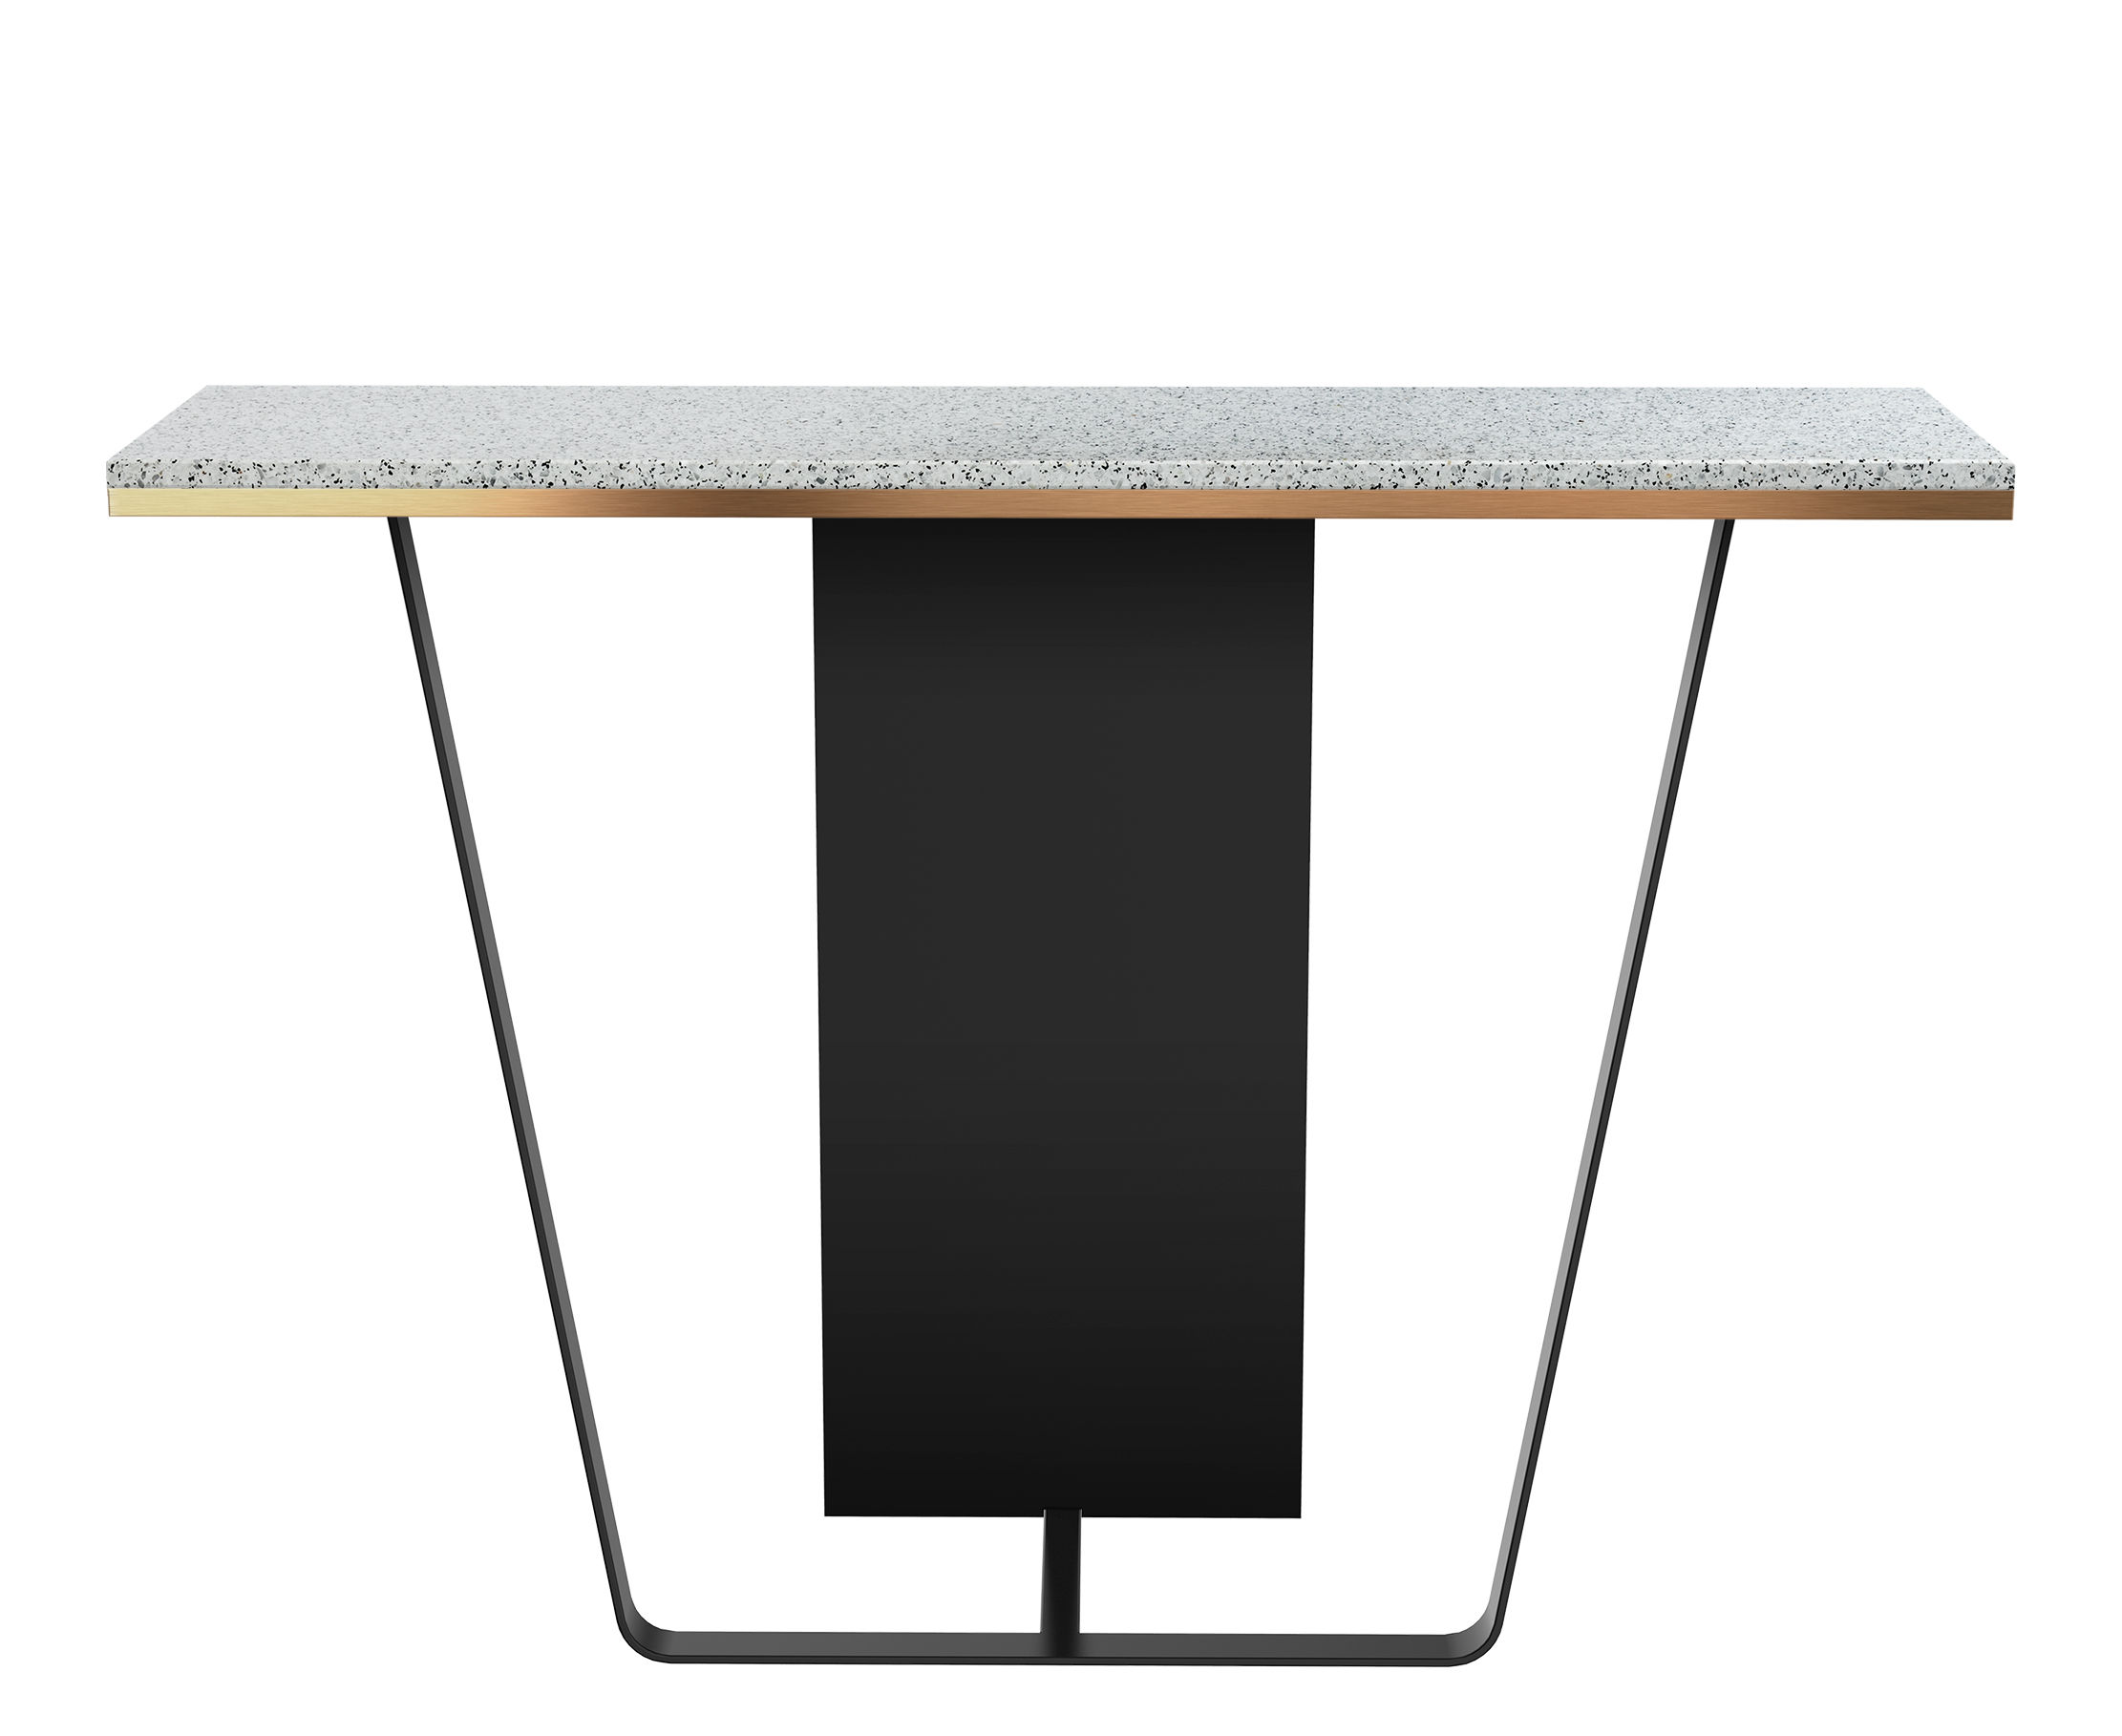 Möbel - Konsole - Terrazzo Large Konsole / L 130 x T 38 cm - RED Edition - Weiß - Holz, lackierter Stahl, Messing, Terrazzo